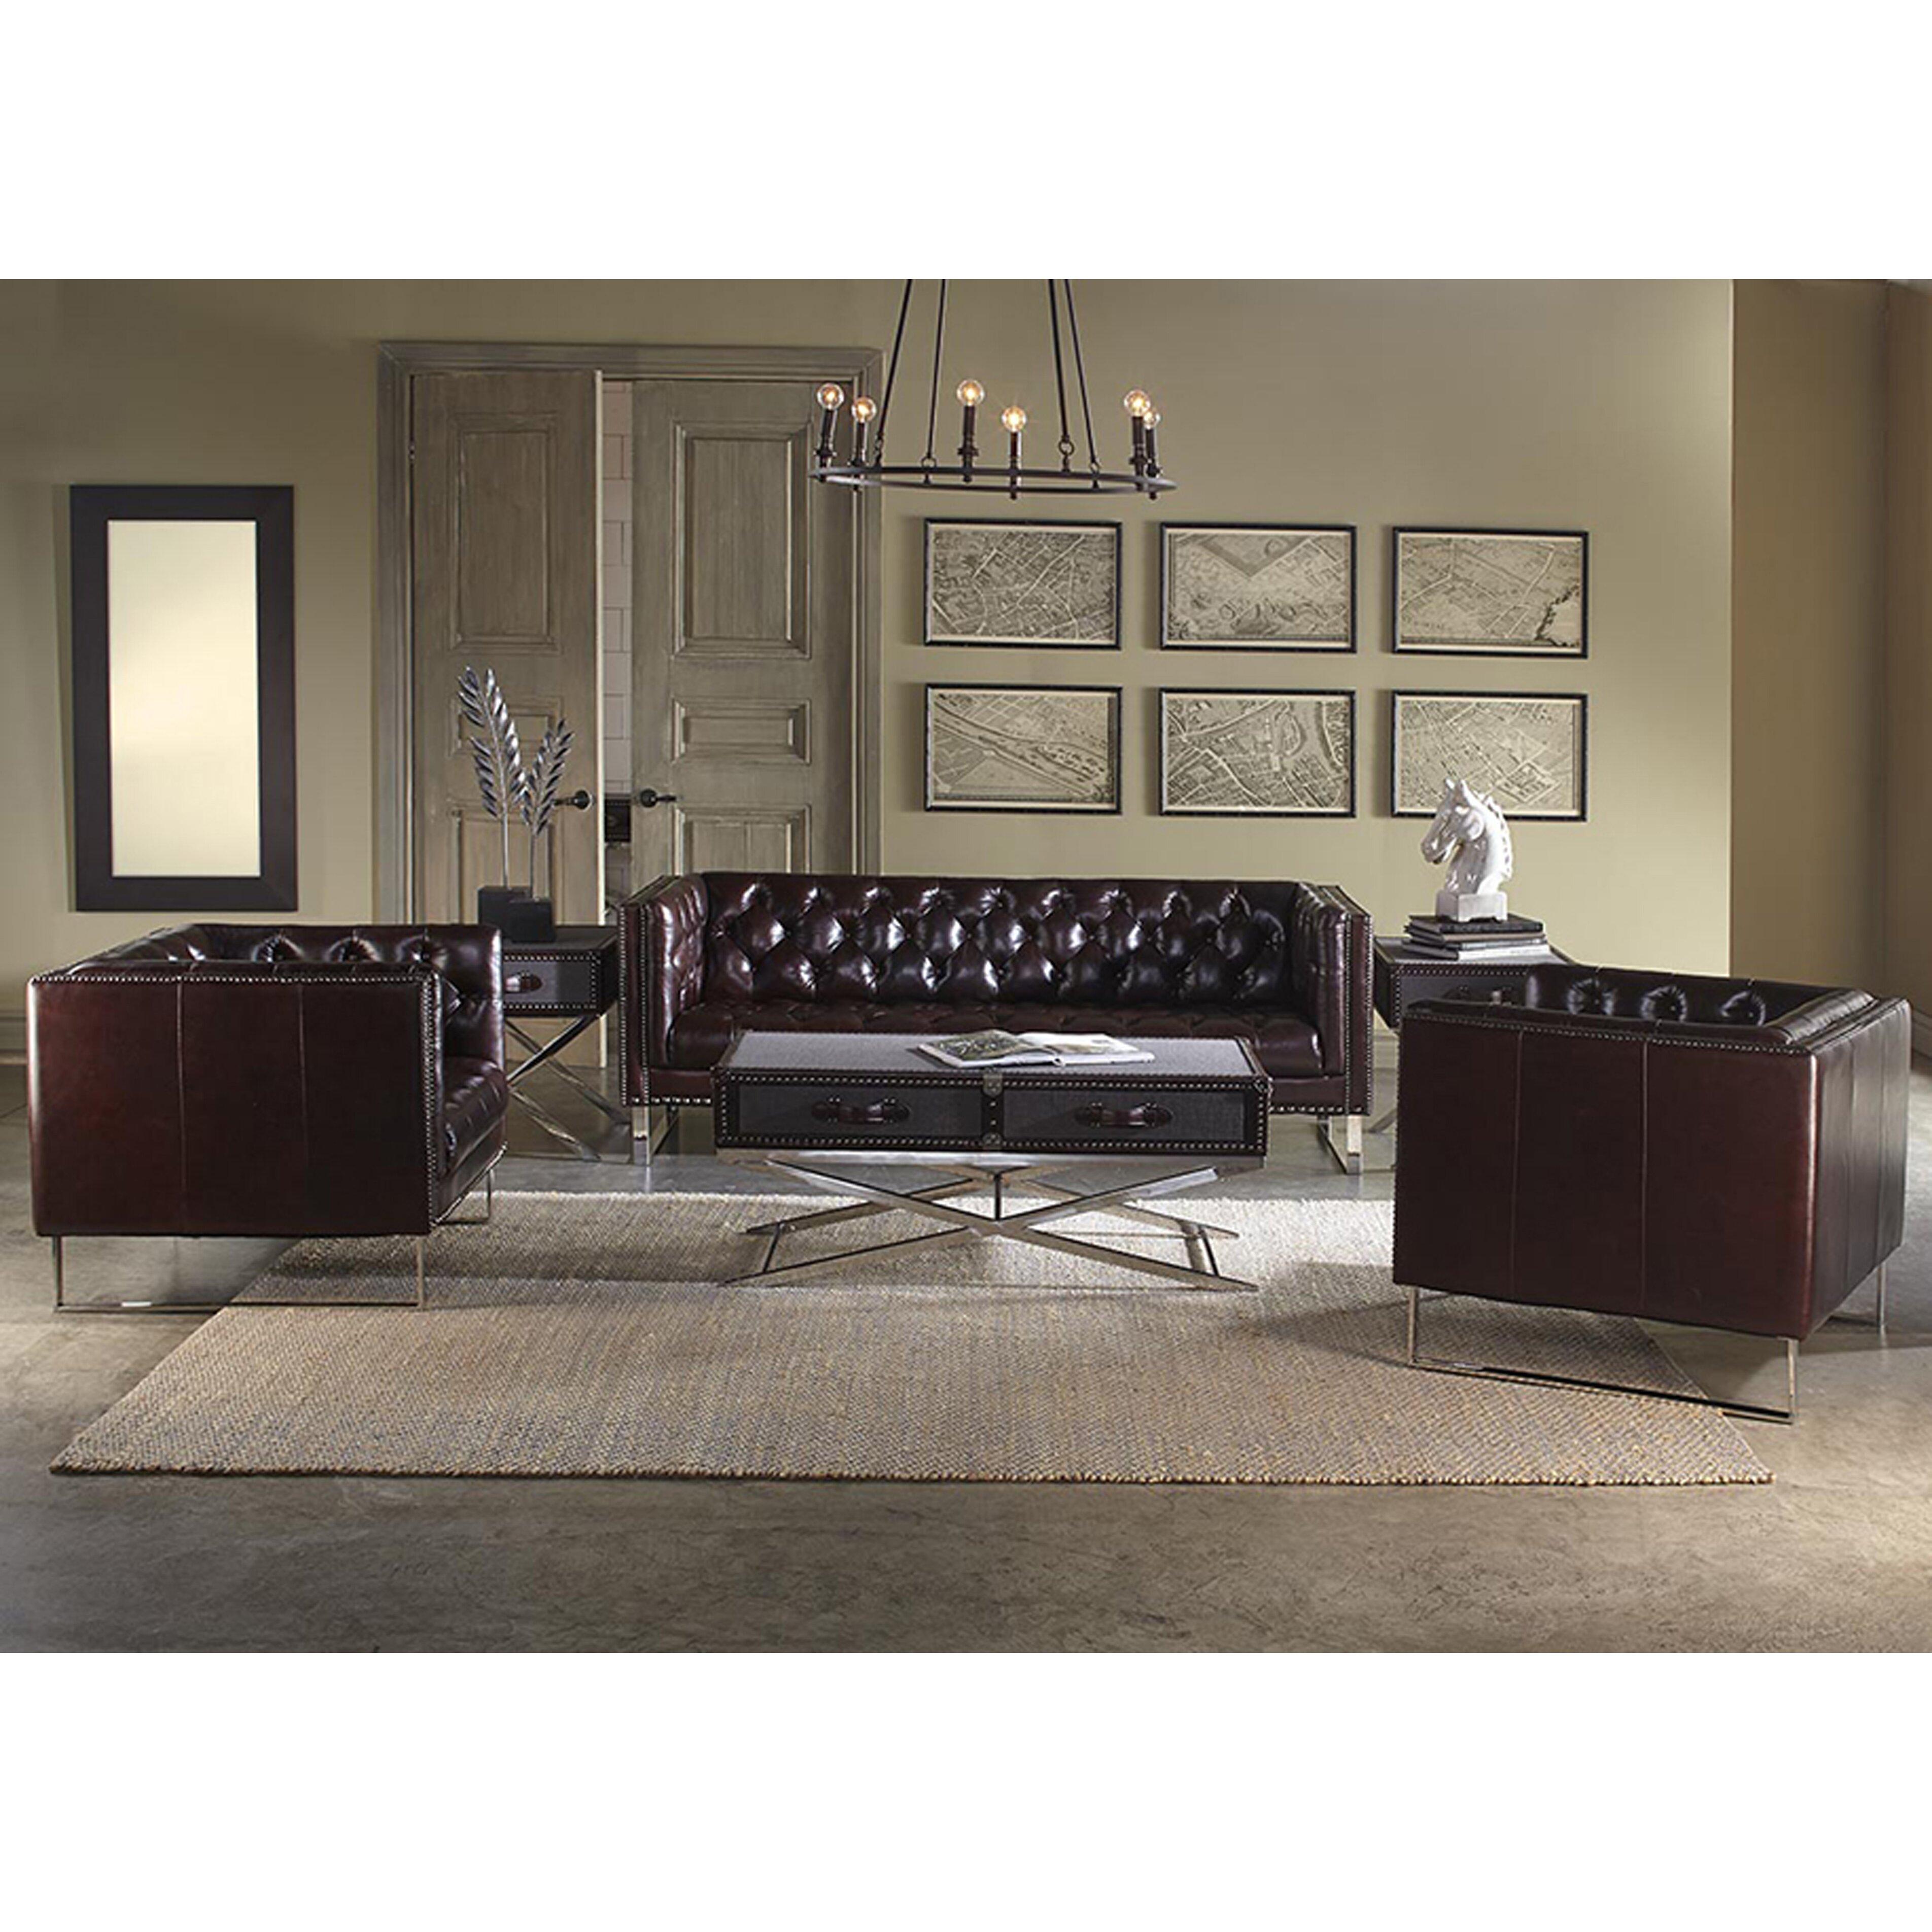 Wayfair Living Room Furniture Lazzaro Leather Bordeaux Living Room Collection Reviews Wayfair